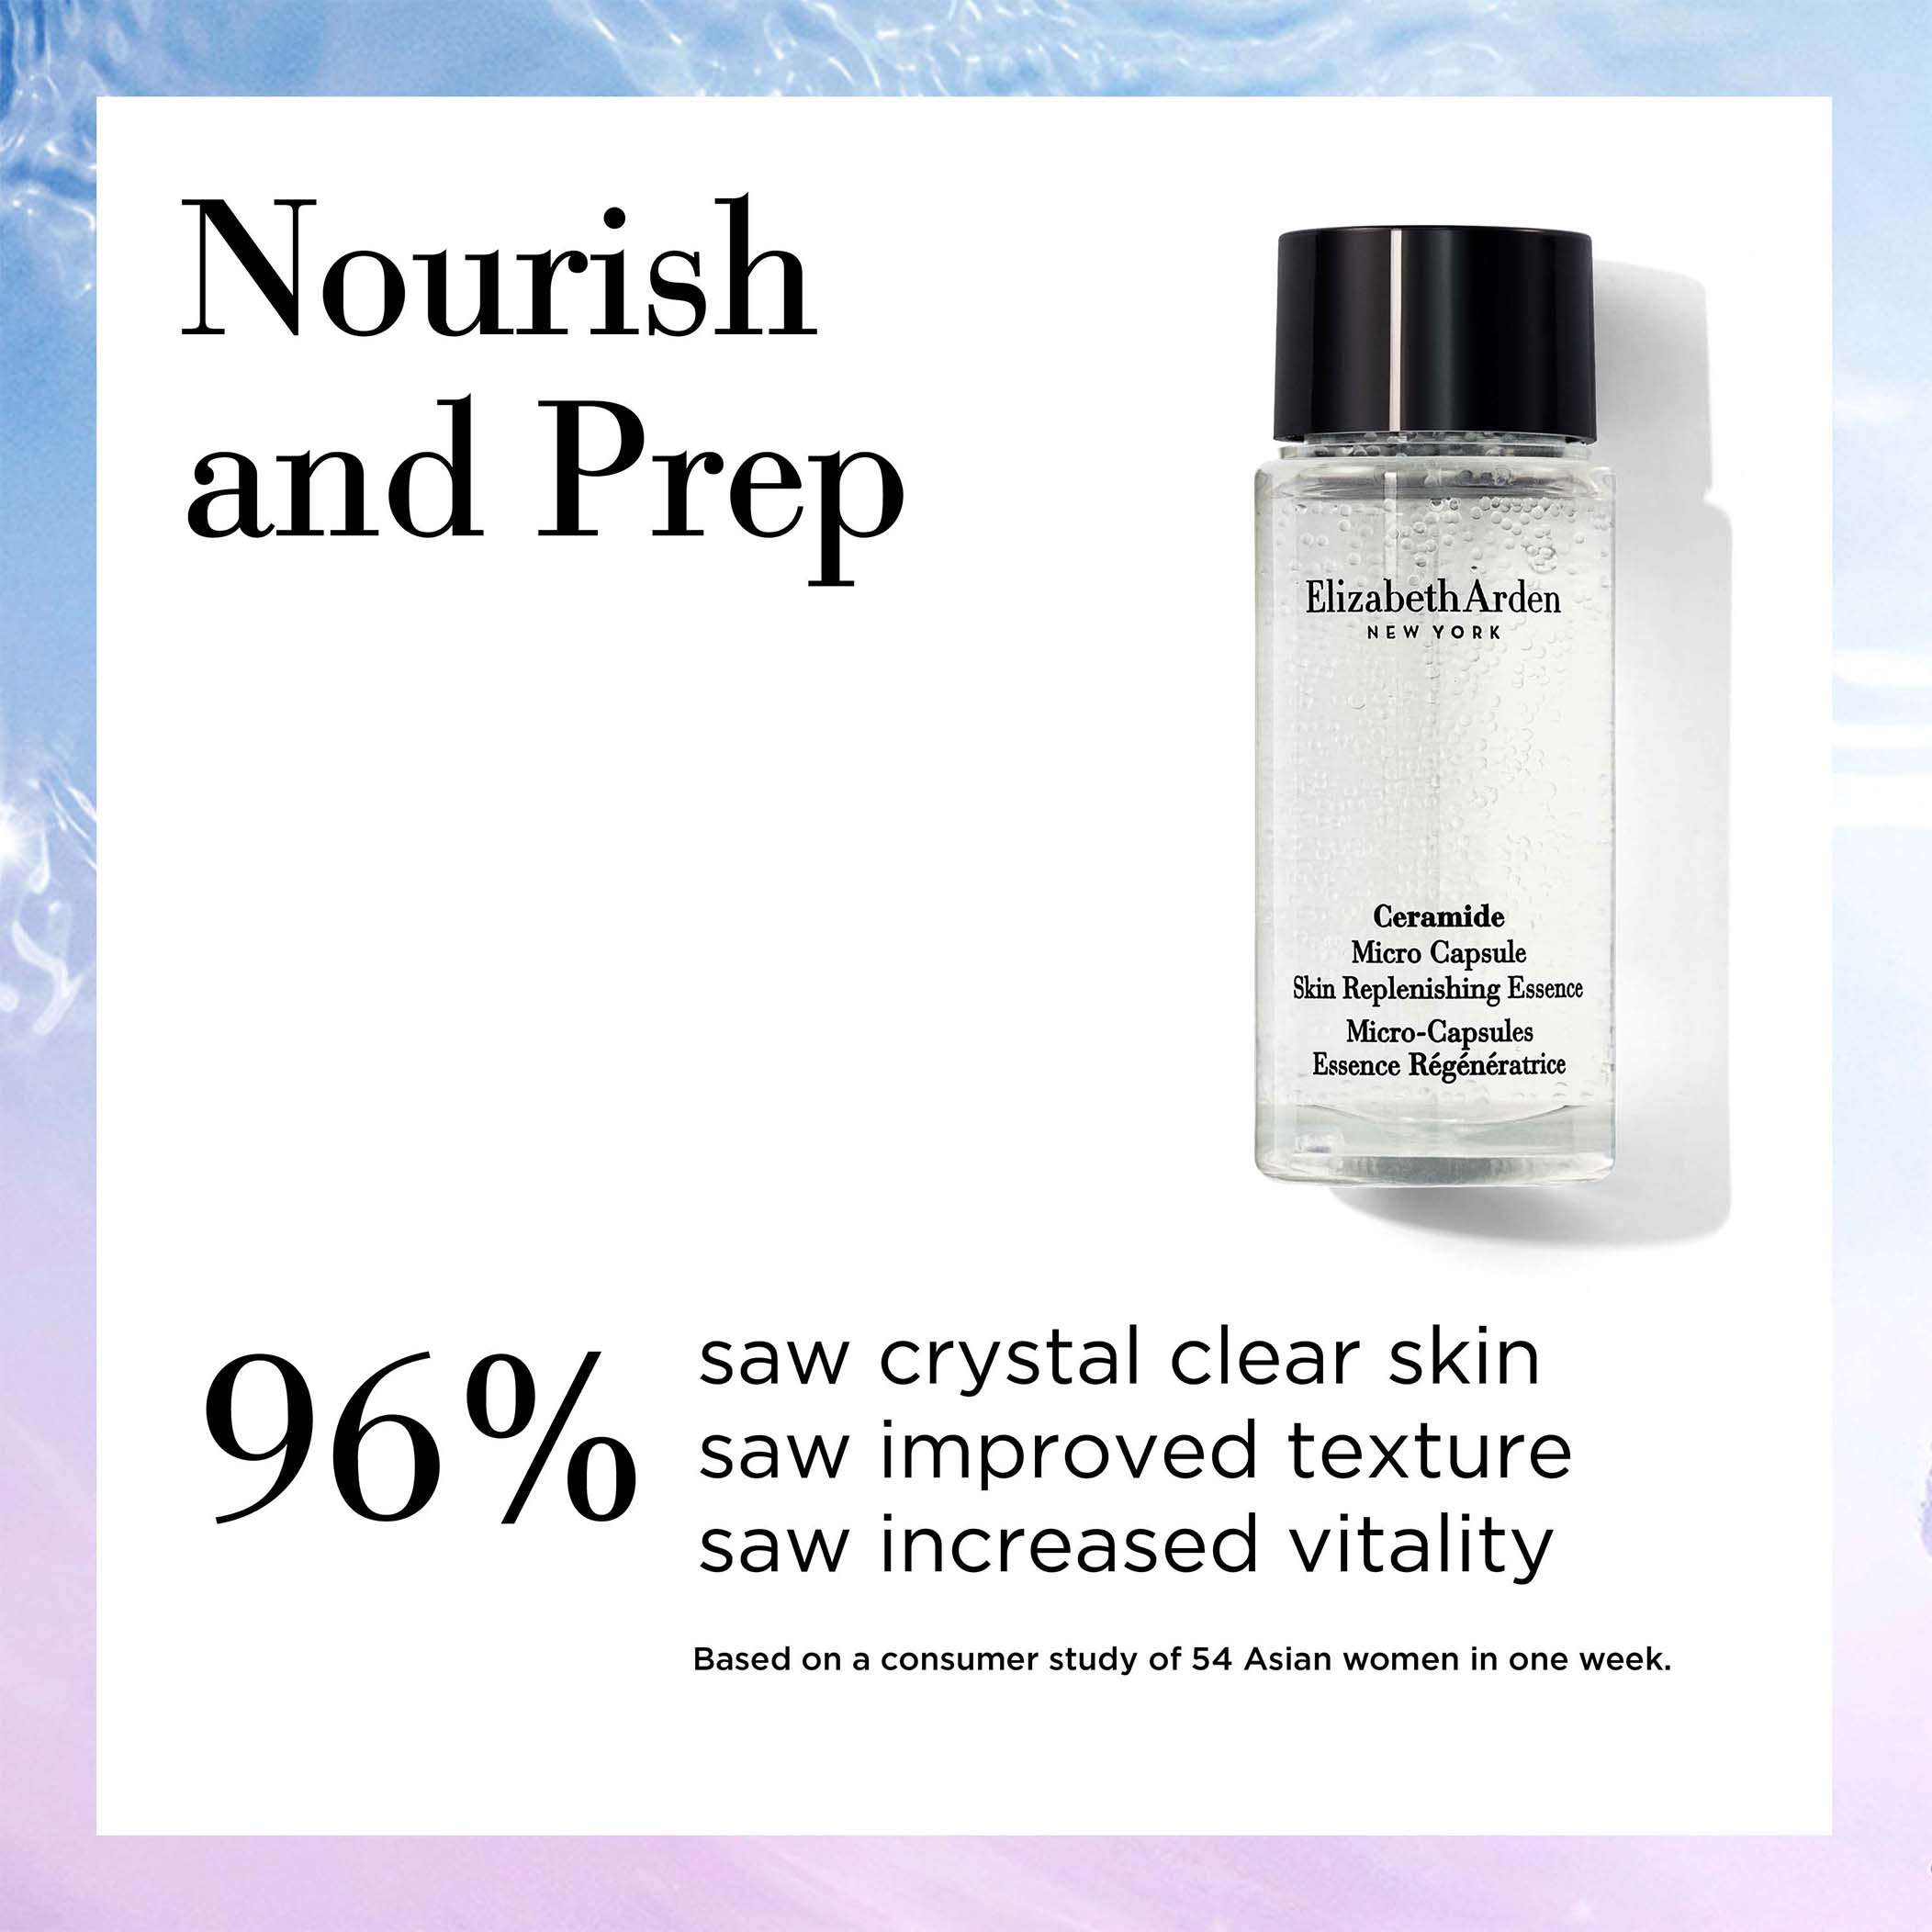 Nourish and prep with Ceramide Micro Capsule Essence